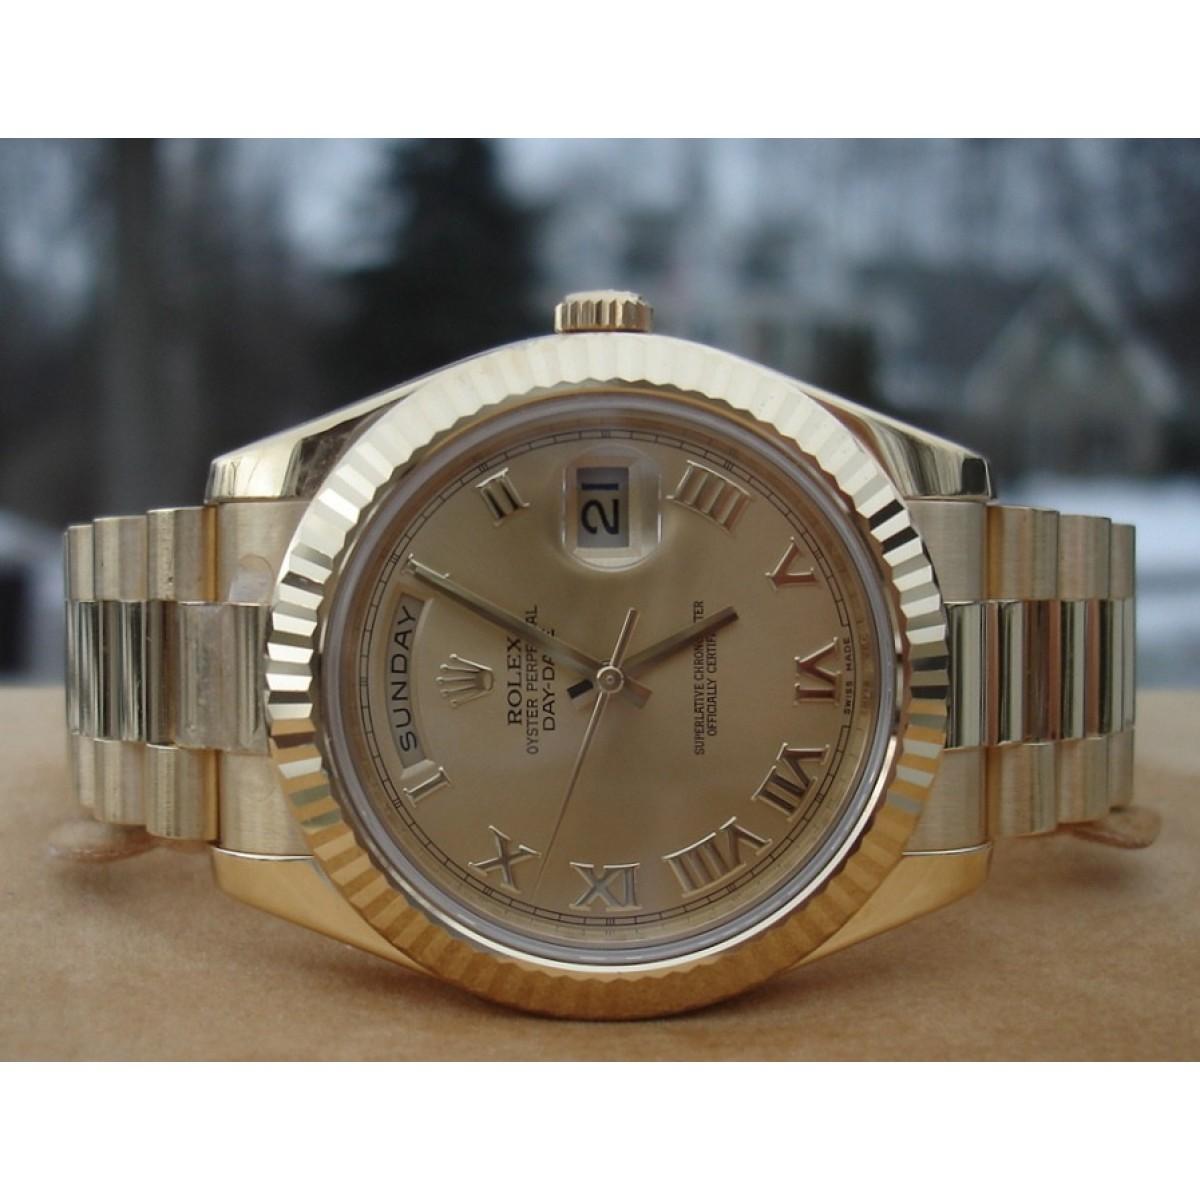 fc0854b7f35 Relógio Réplica Rolex Day Date Presidente